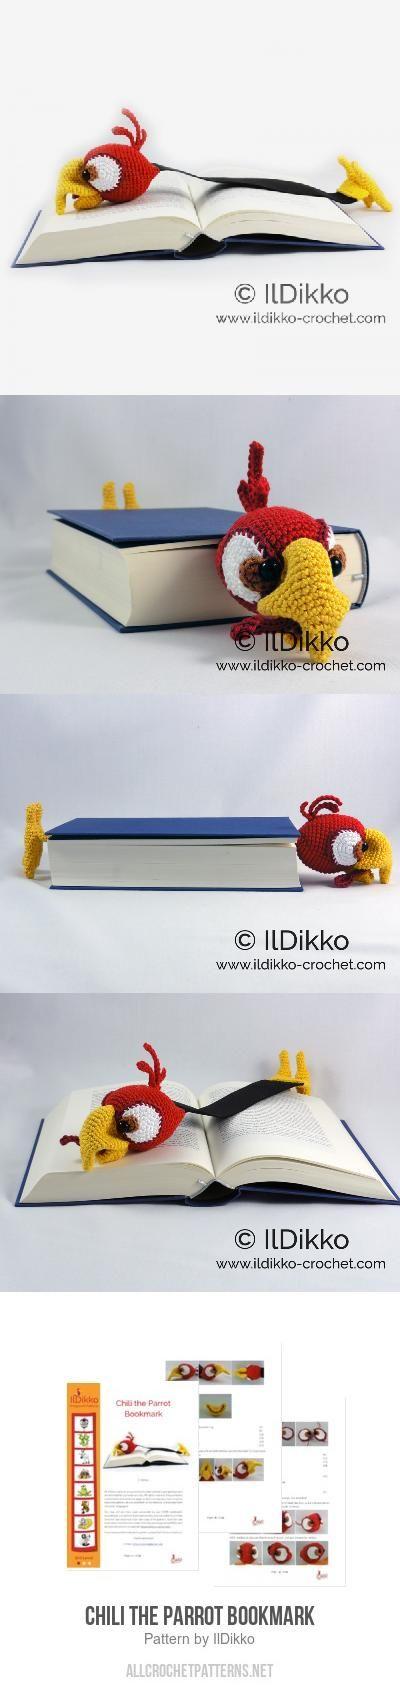 Chili the Parrot Bookmark crochet pattern